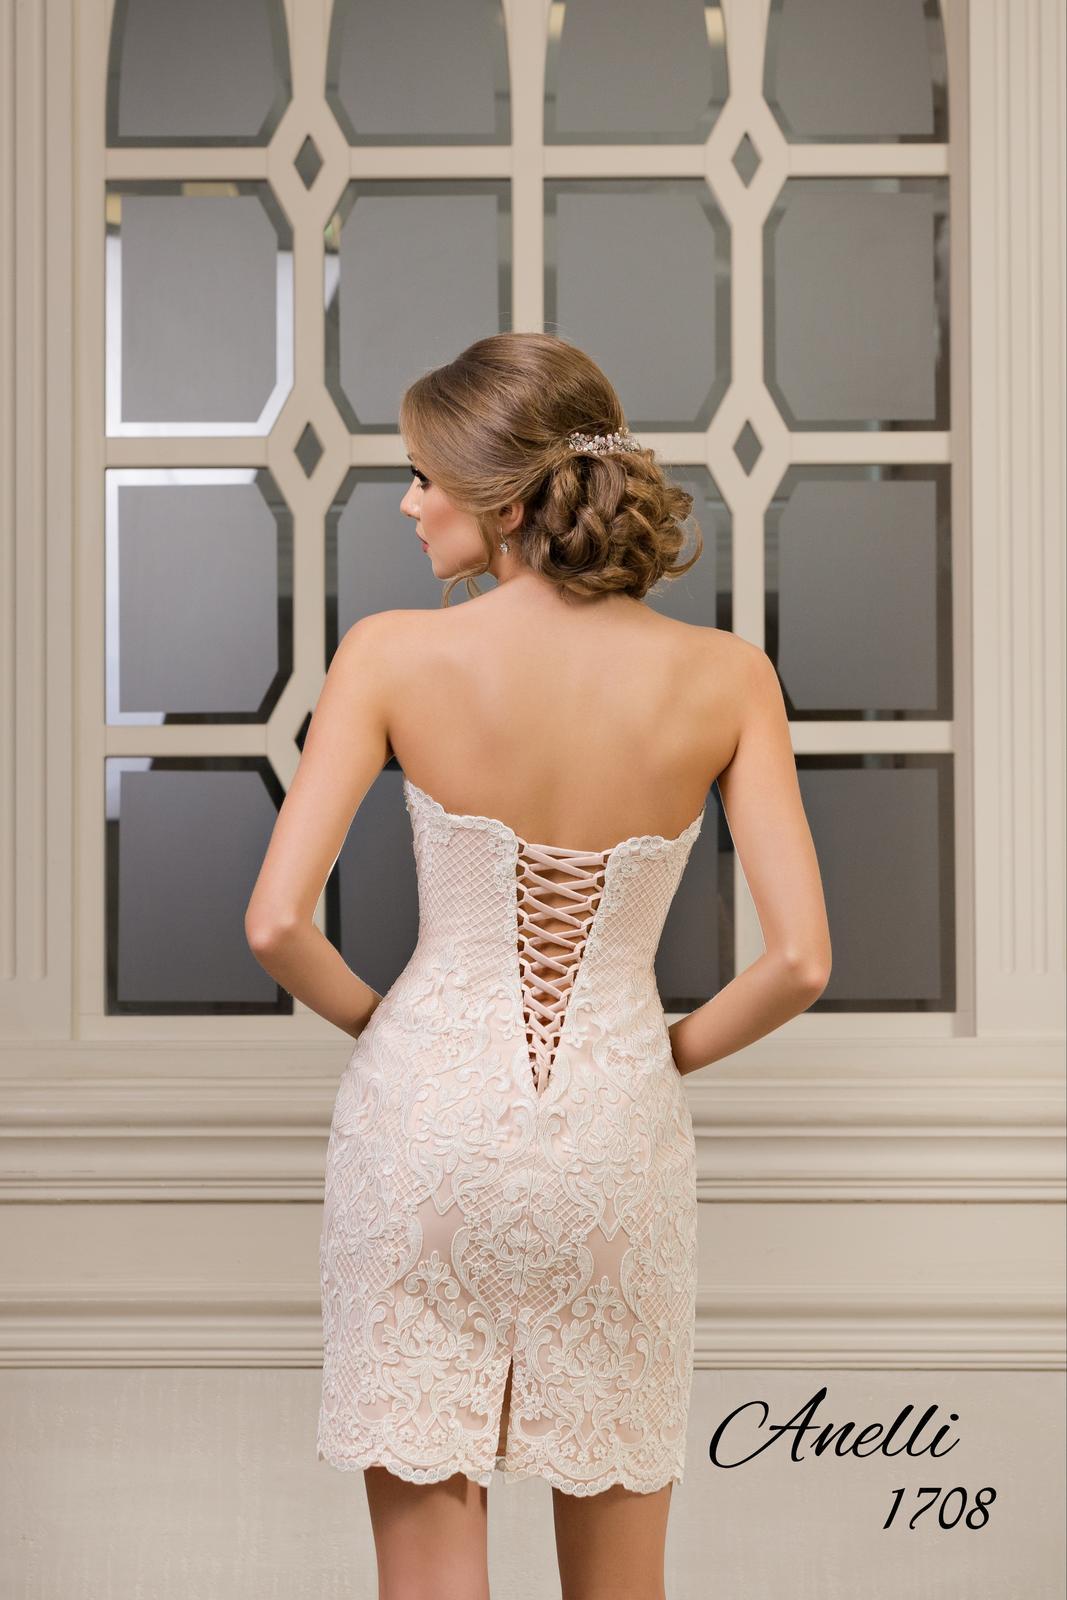 Svadobné šaty - Debut 1708 - Obrázok č. 3